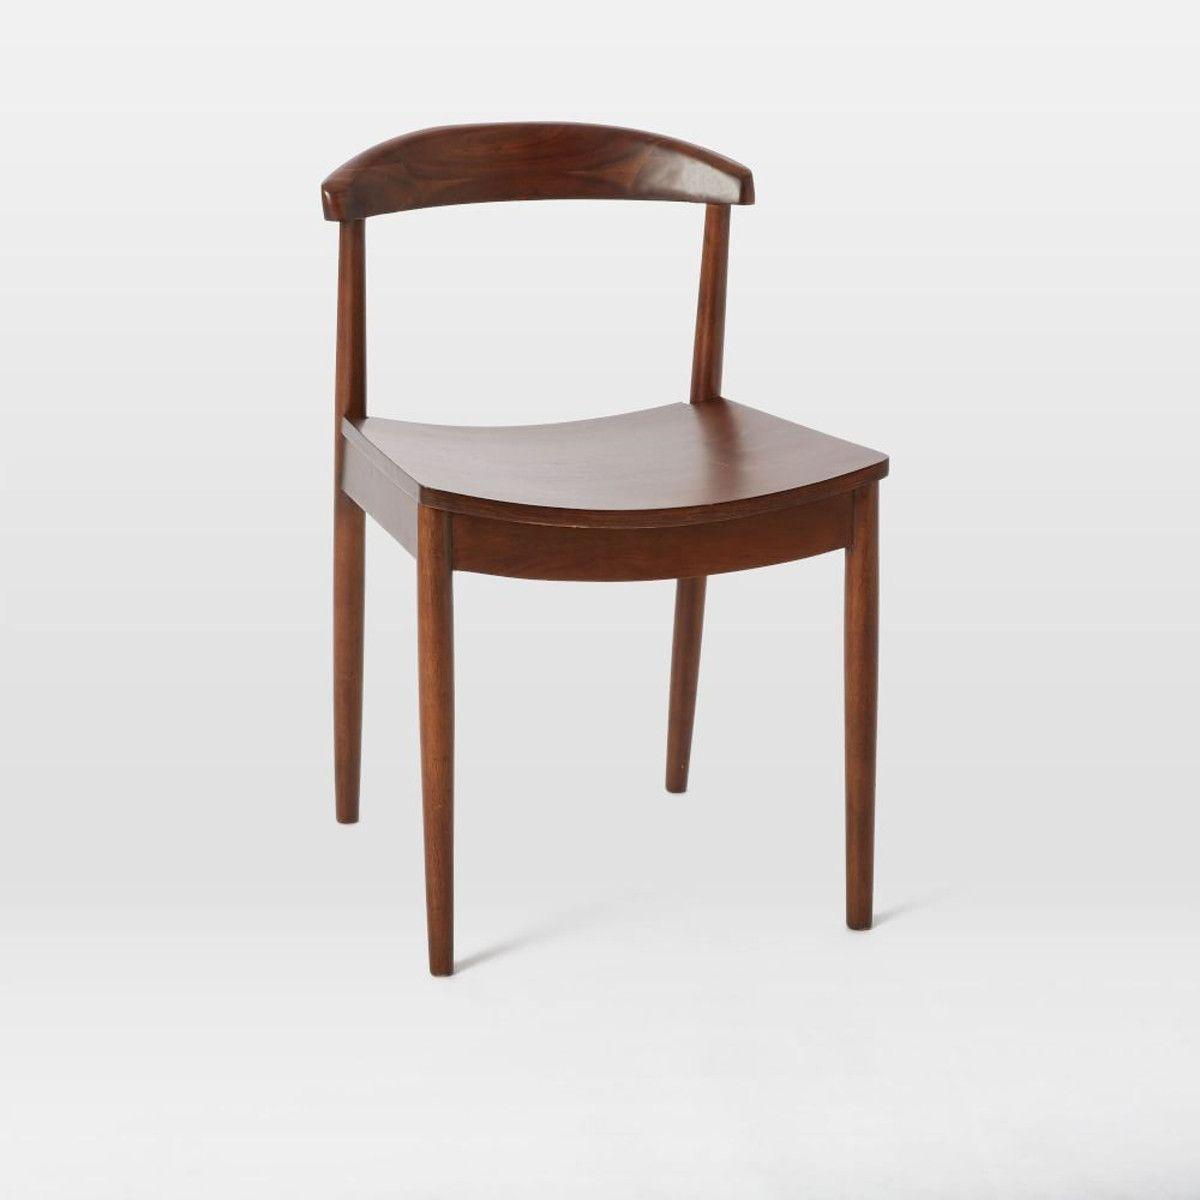 West Elm. Lena Mid Century Dining Chair